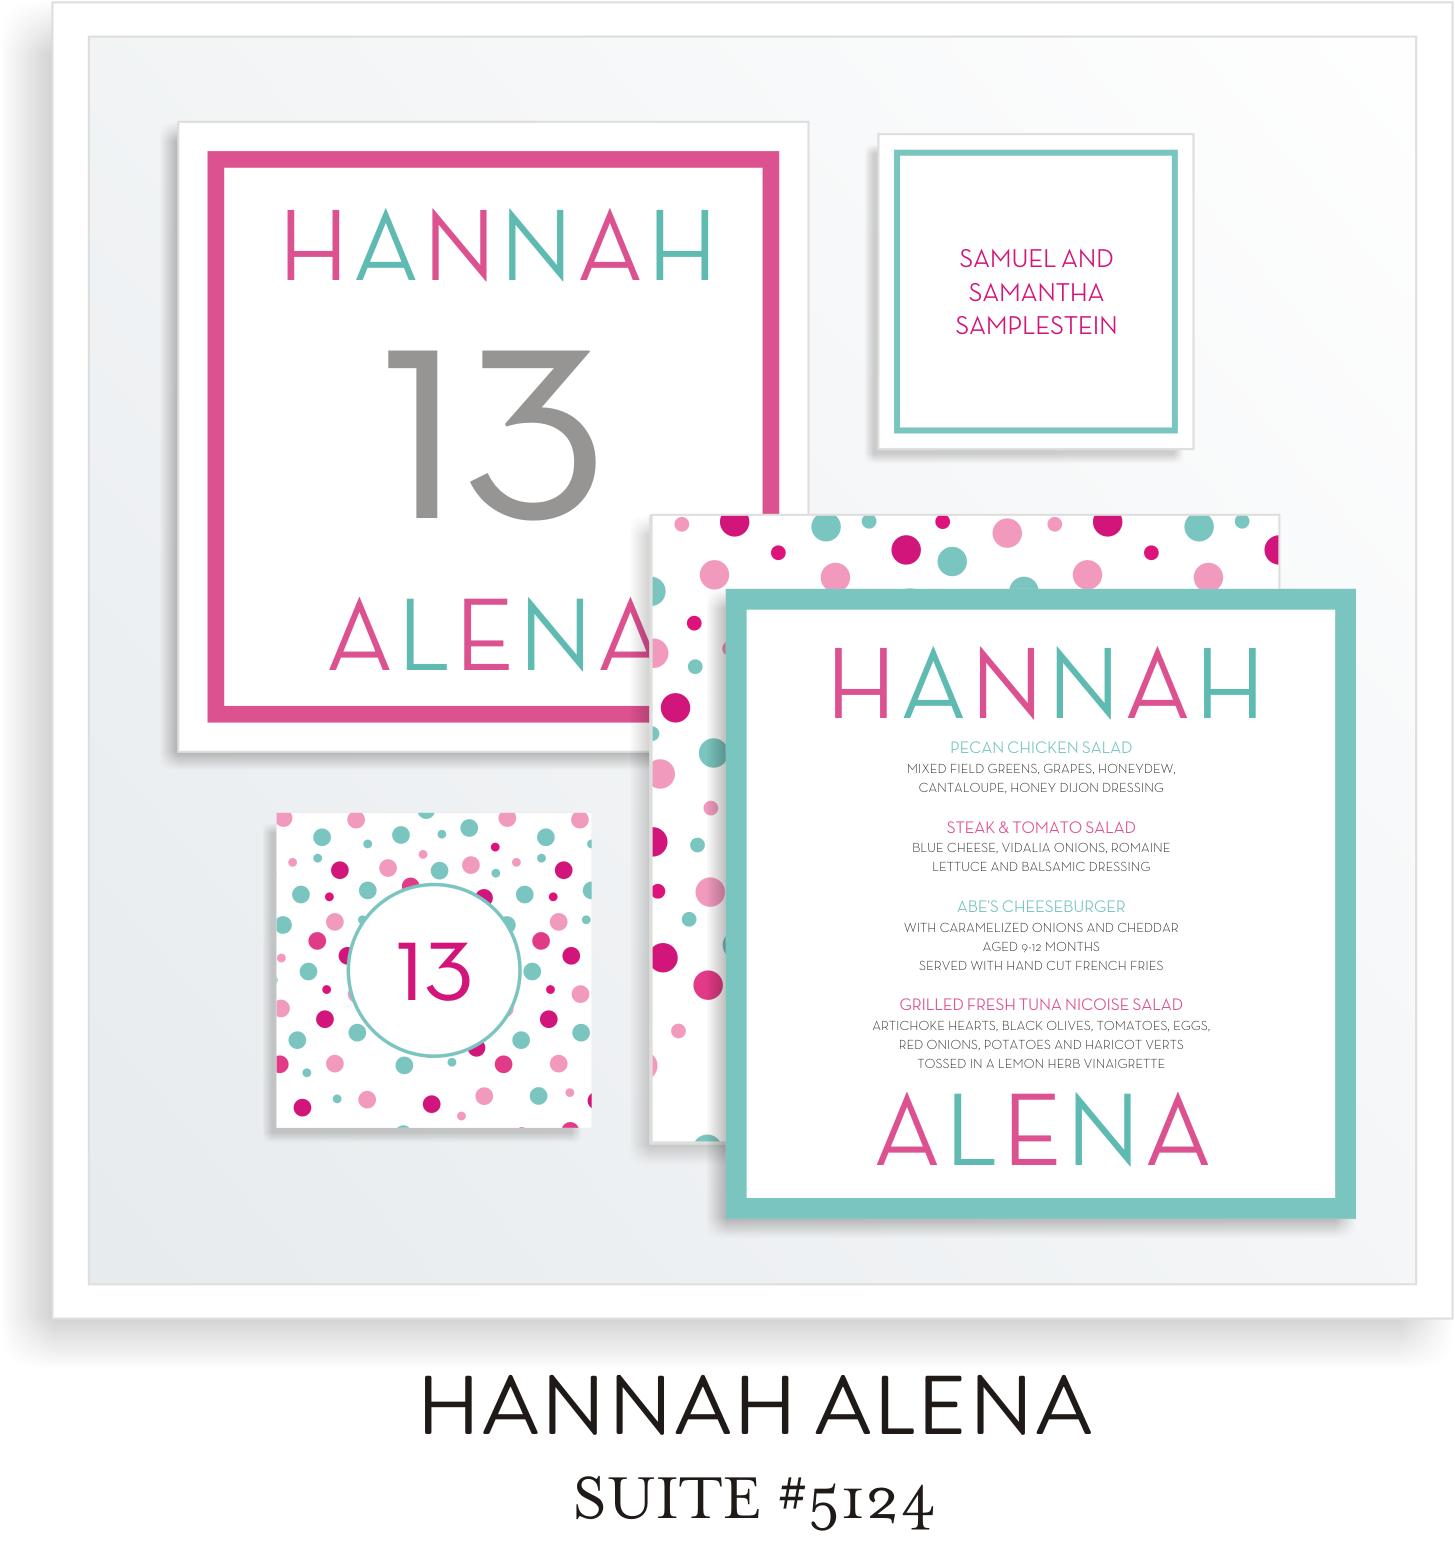 Table Top Decor Bat Mitzvah Suite 5124 - Hannah Alena